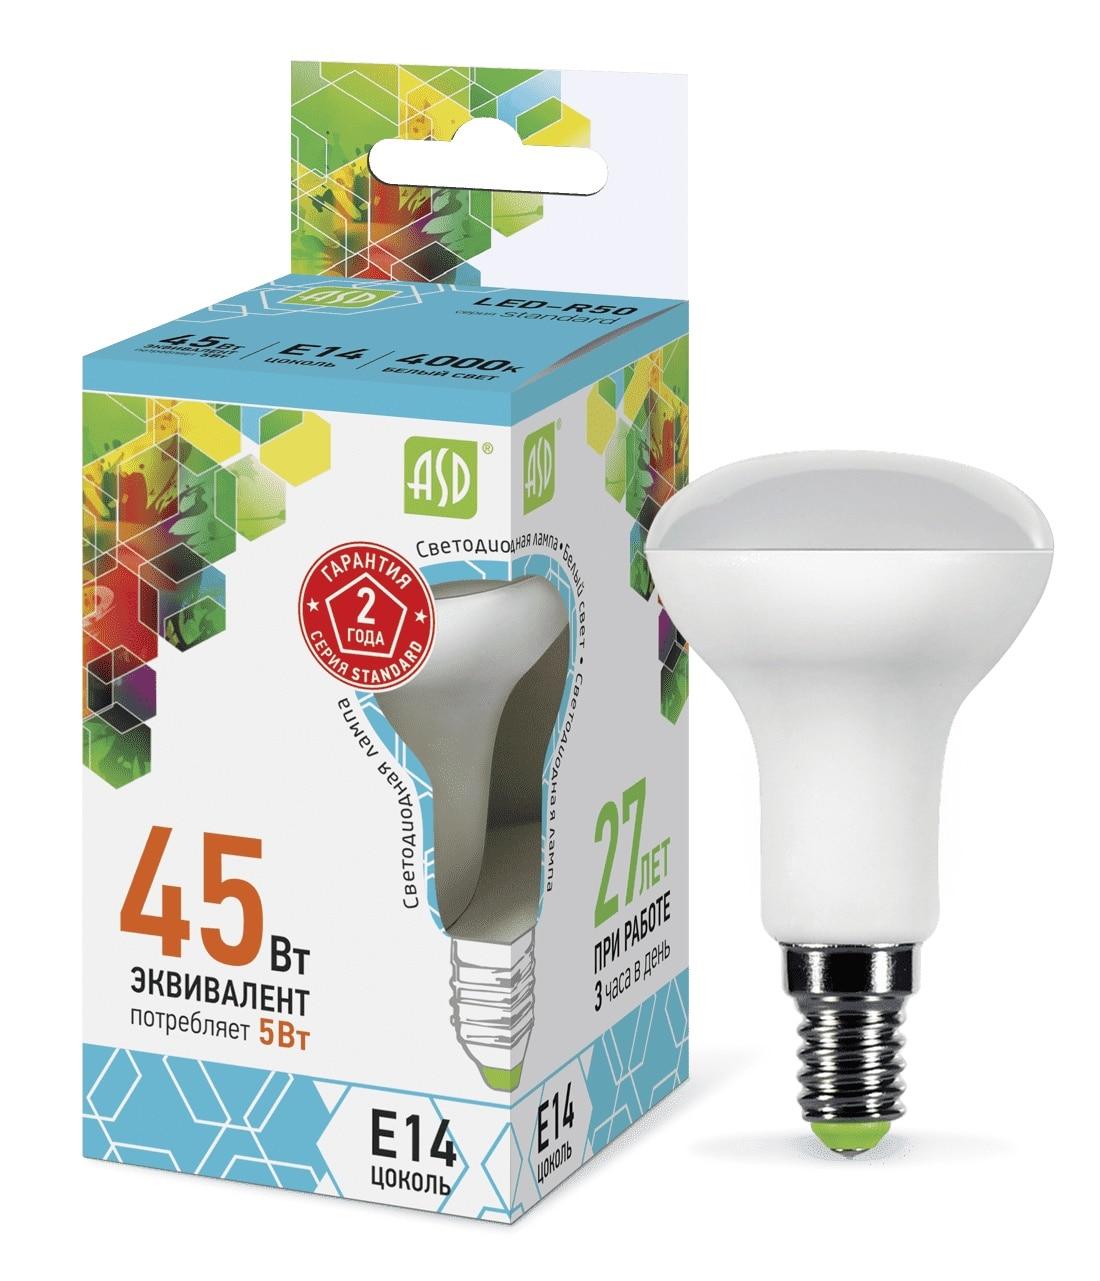 Lamp Led Led-r50-standard 5w 160-260v E14 4000 K 450lm ASD 4690612001517